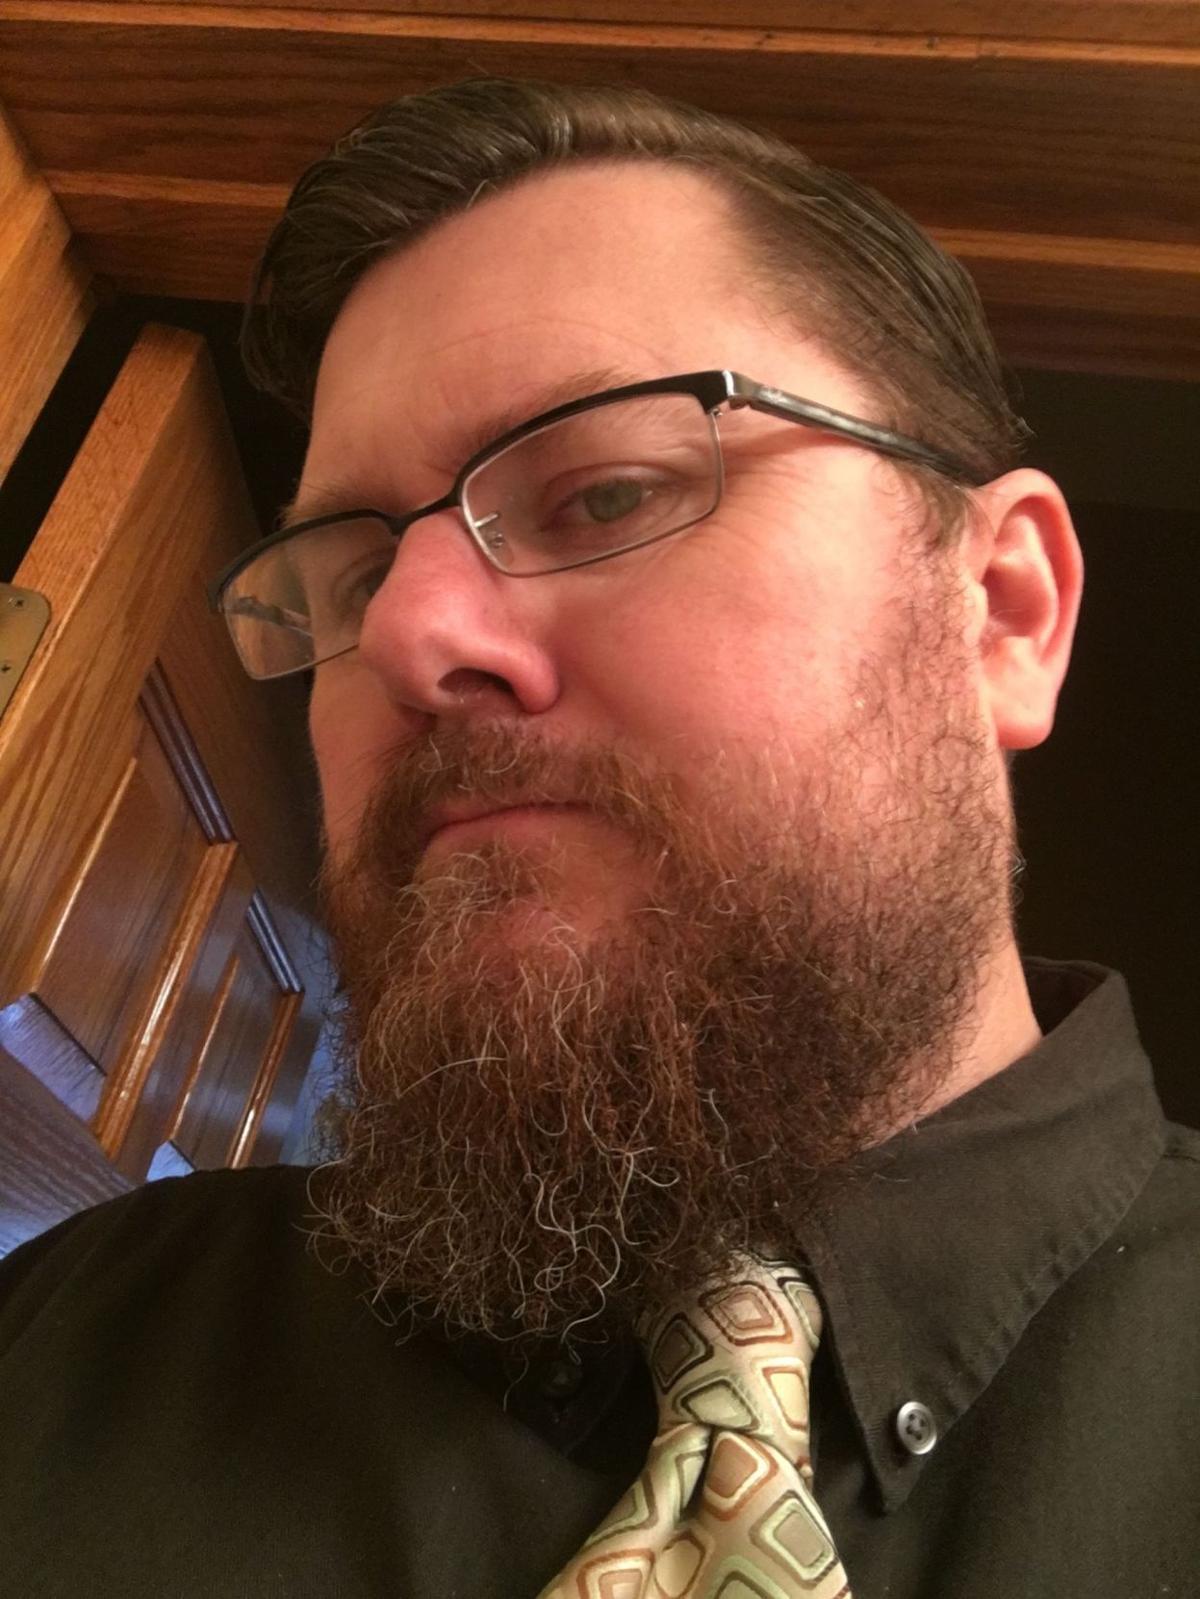 Chase's long beard